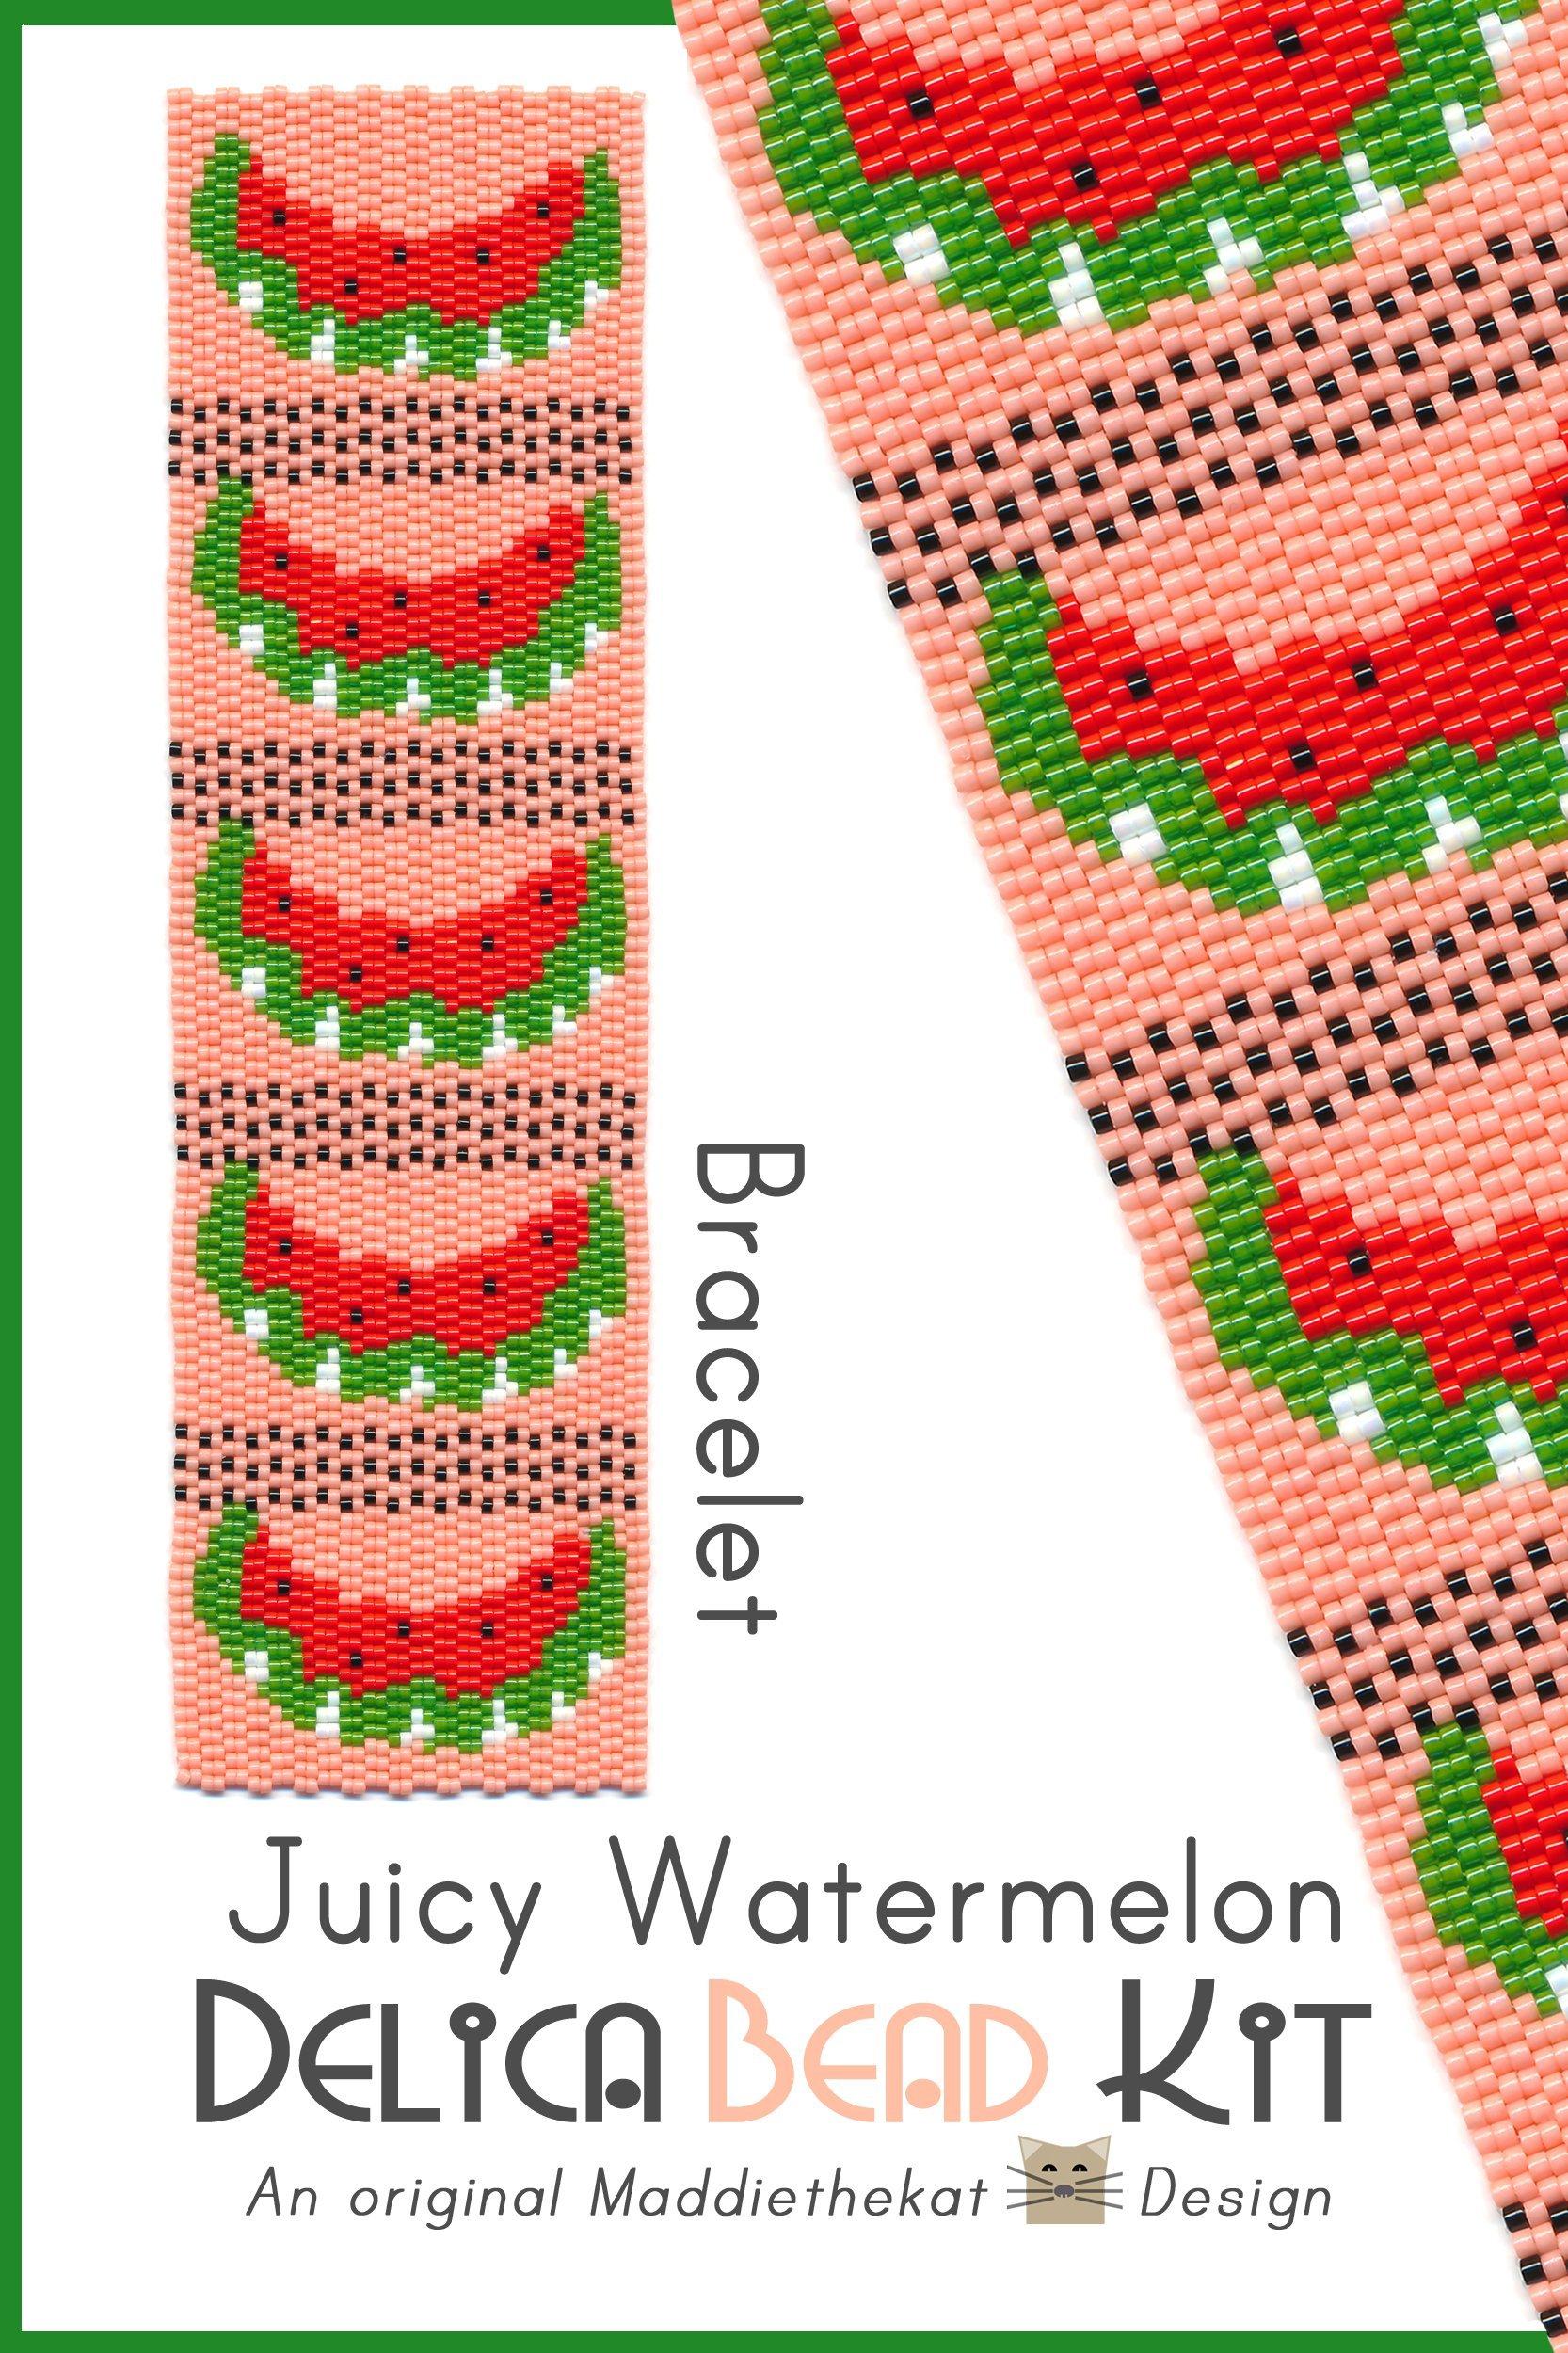 Juicy Watermelon Wide Cuff Bracelet 2-Drop Peyote Pattern Delica Seed Bead DIY Fruit-Maddiethekat Designs